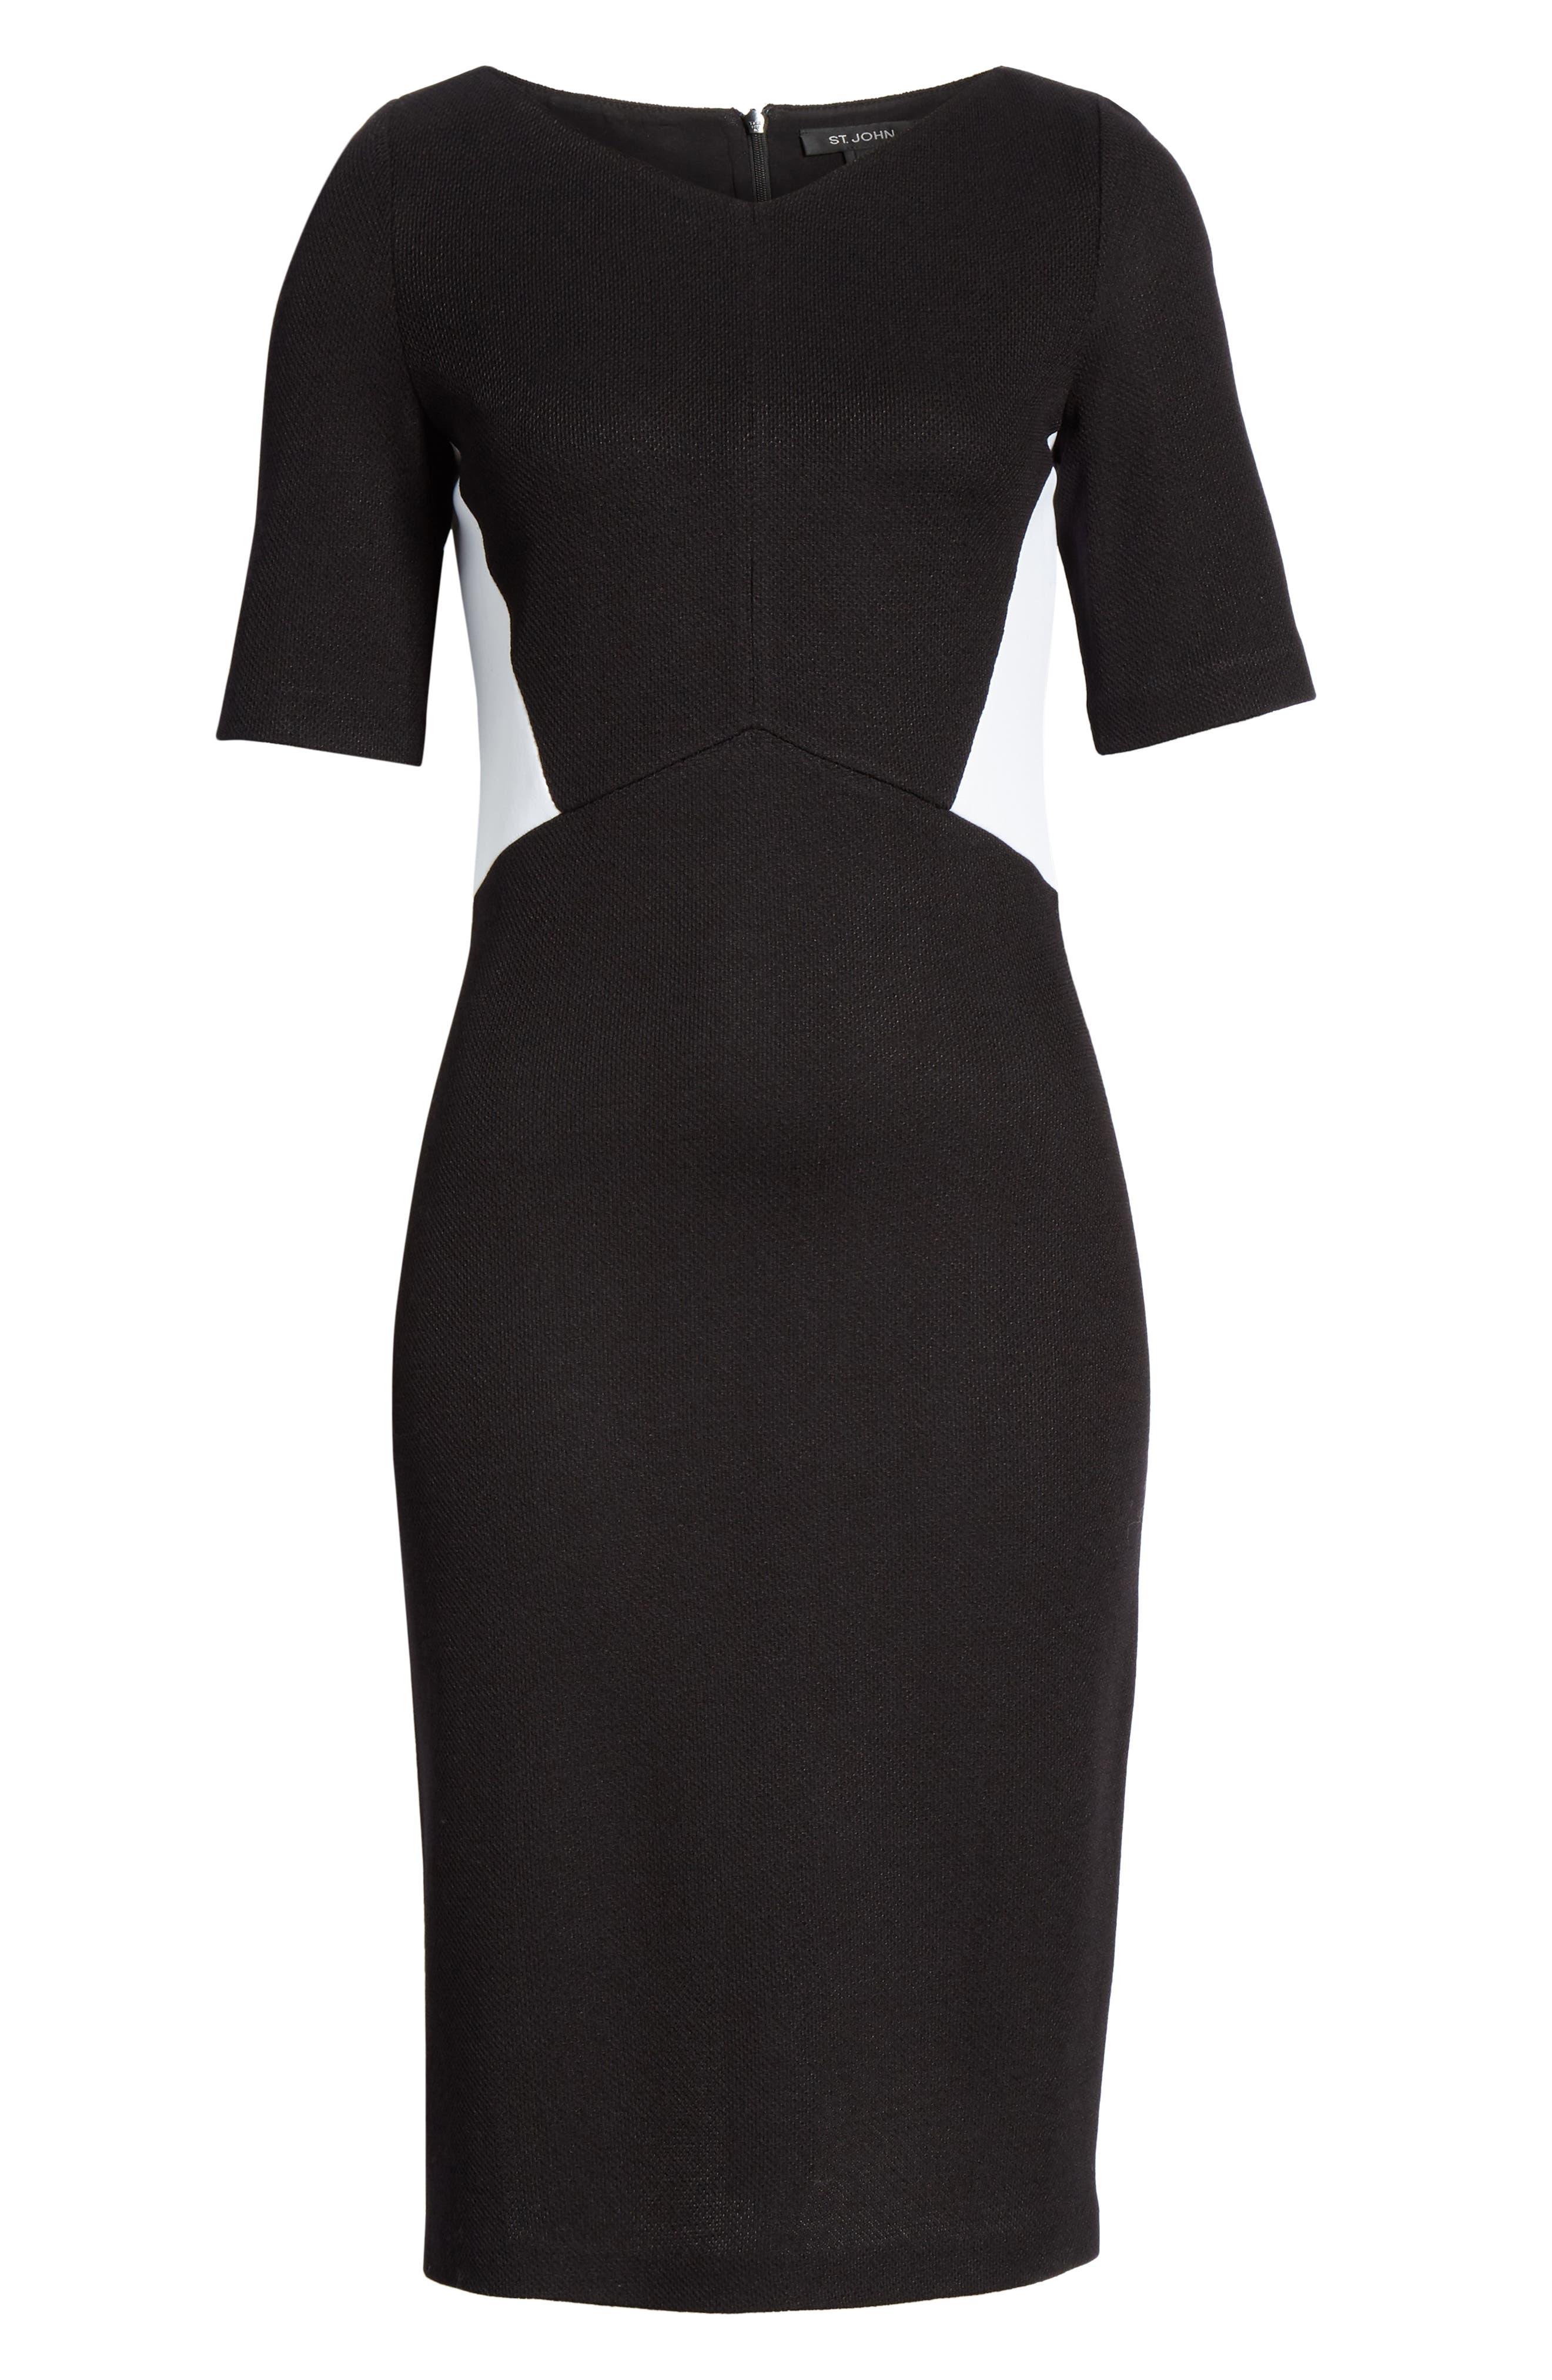 ST. JOHN COLLECTION, Piqué Milano Knit Dress, Alternate thumbnail 7, color, CAVIAR/ BIANCO